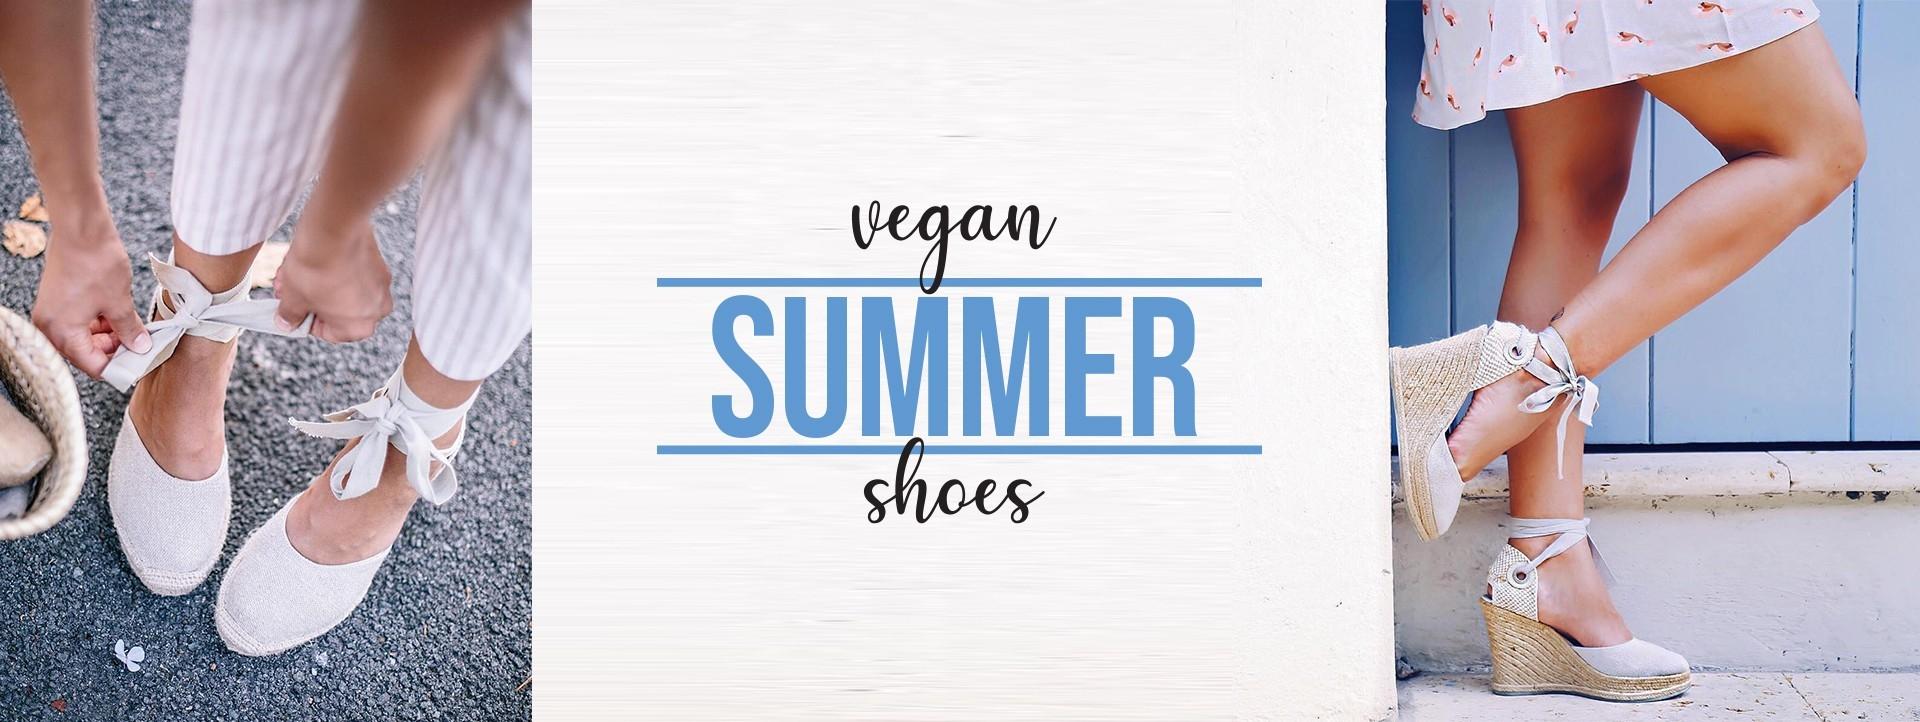 Cervera - VeganShoes.it